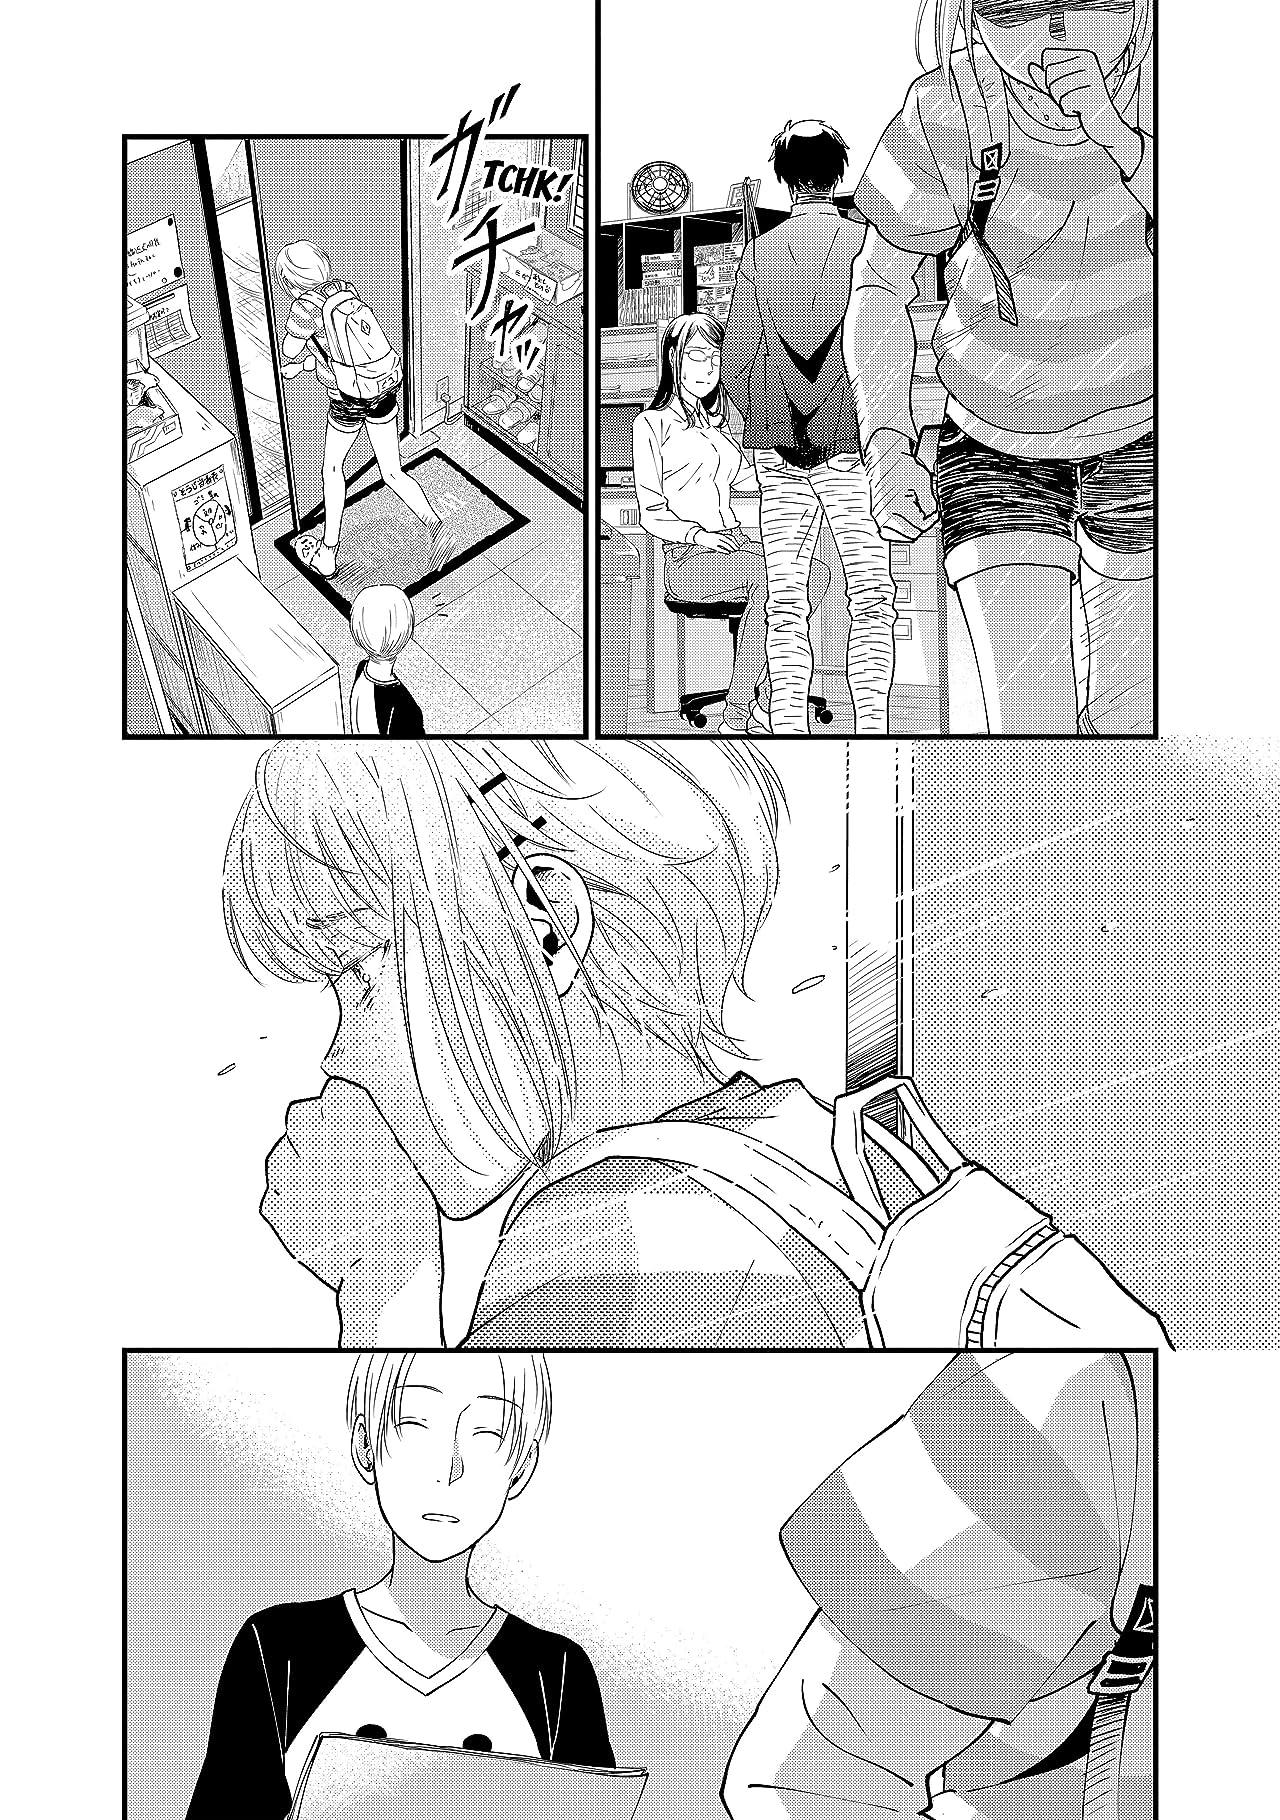 Animeta! Vol. 3